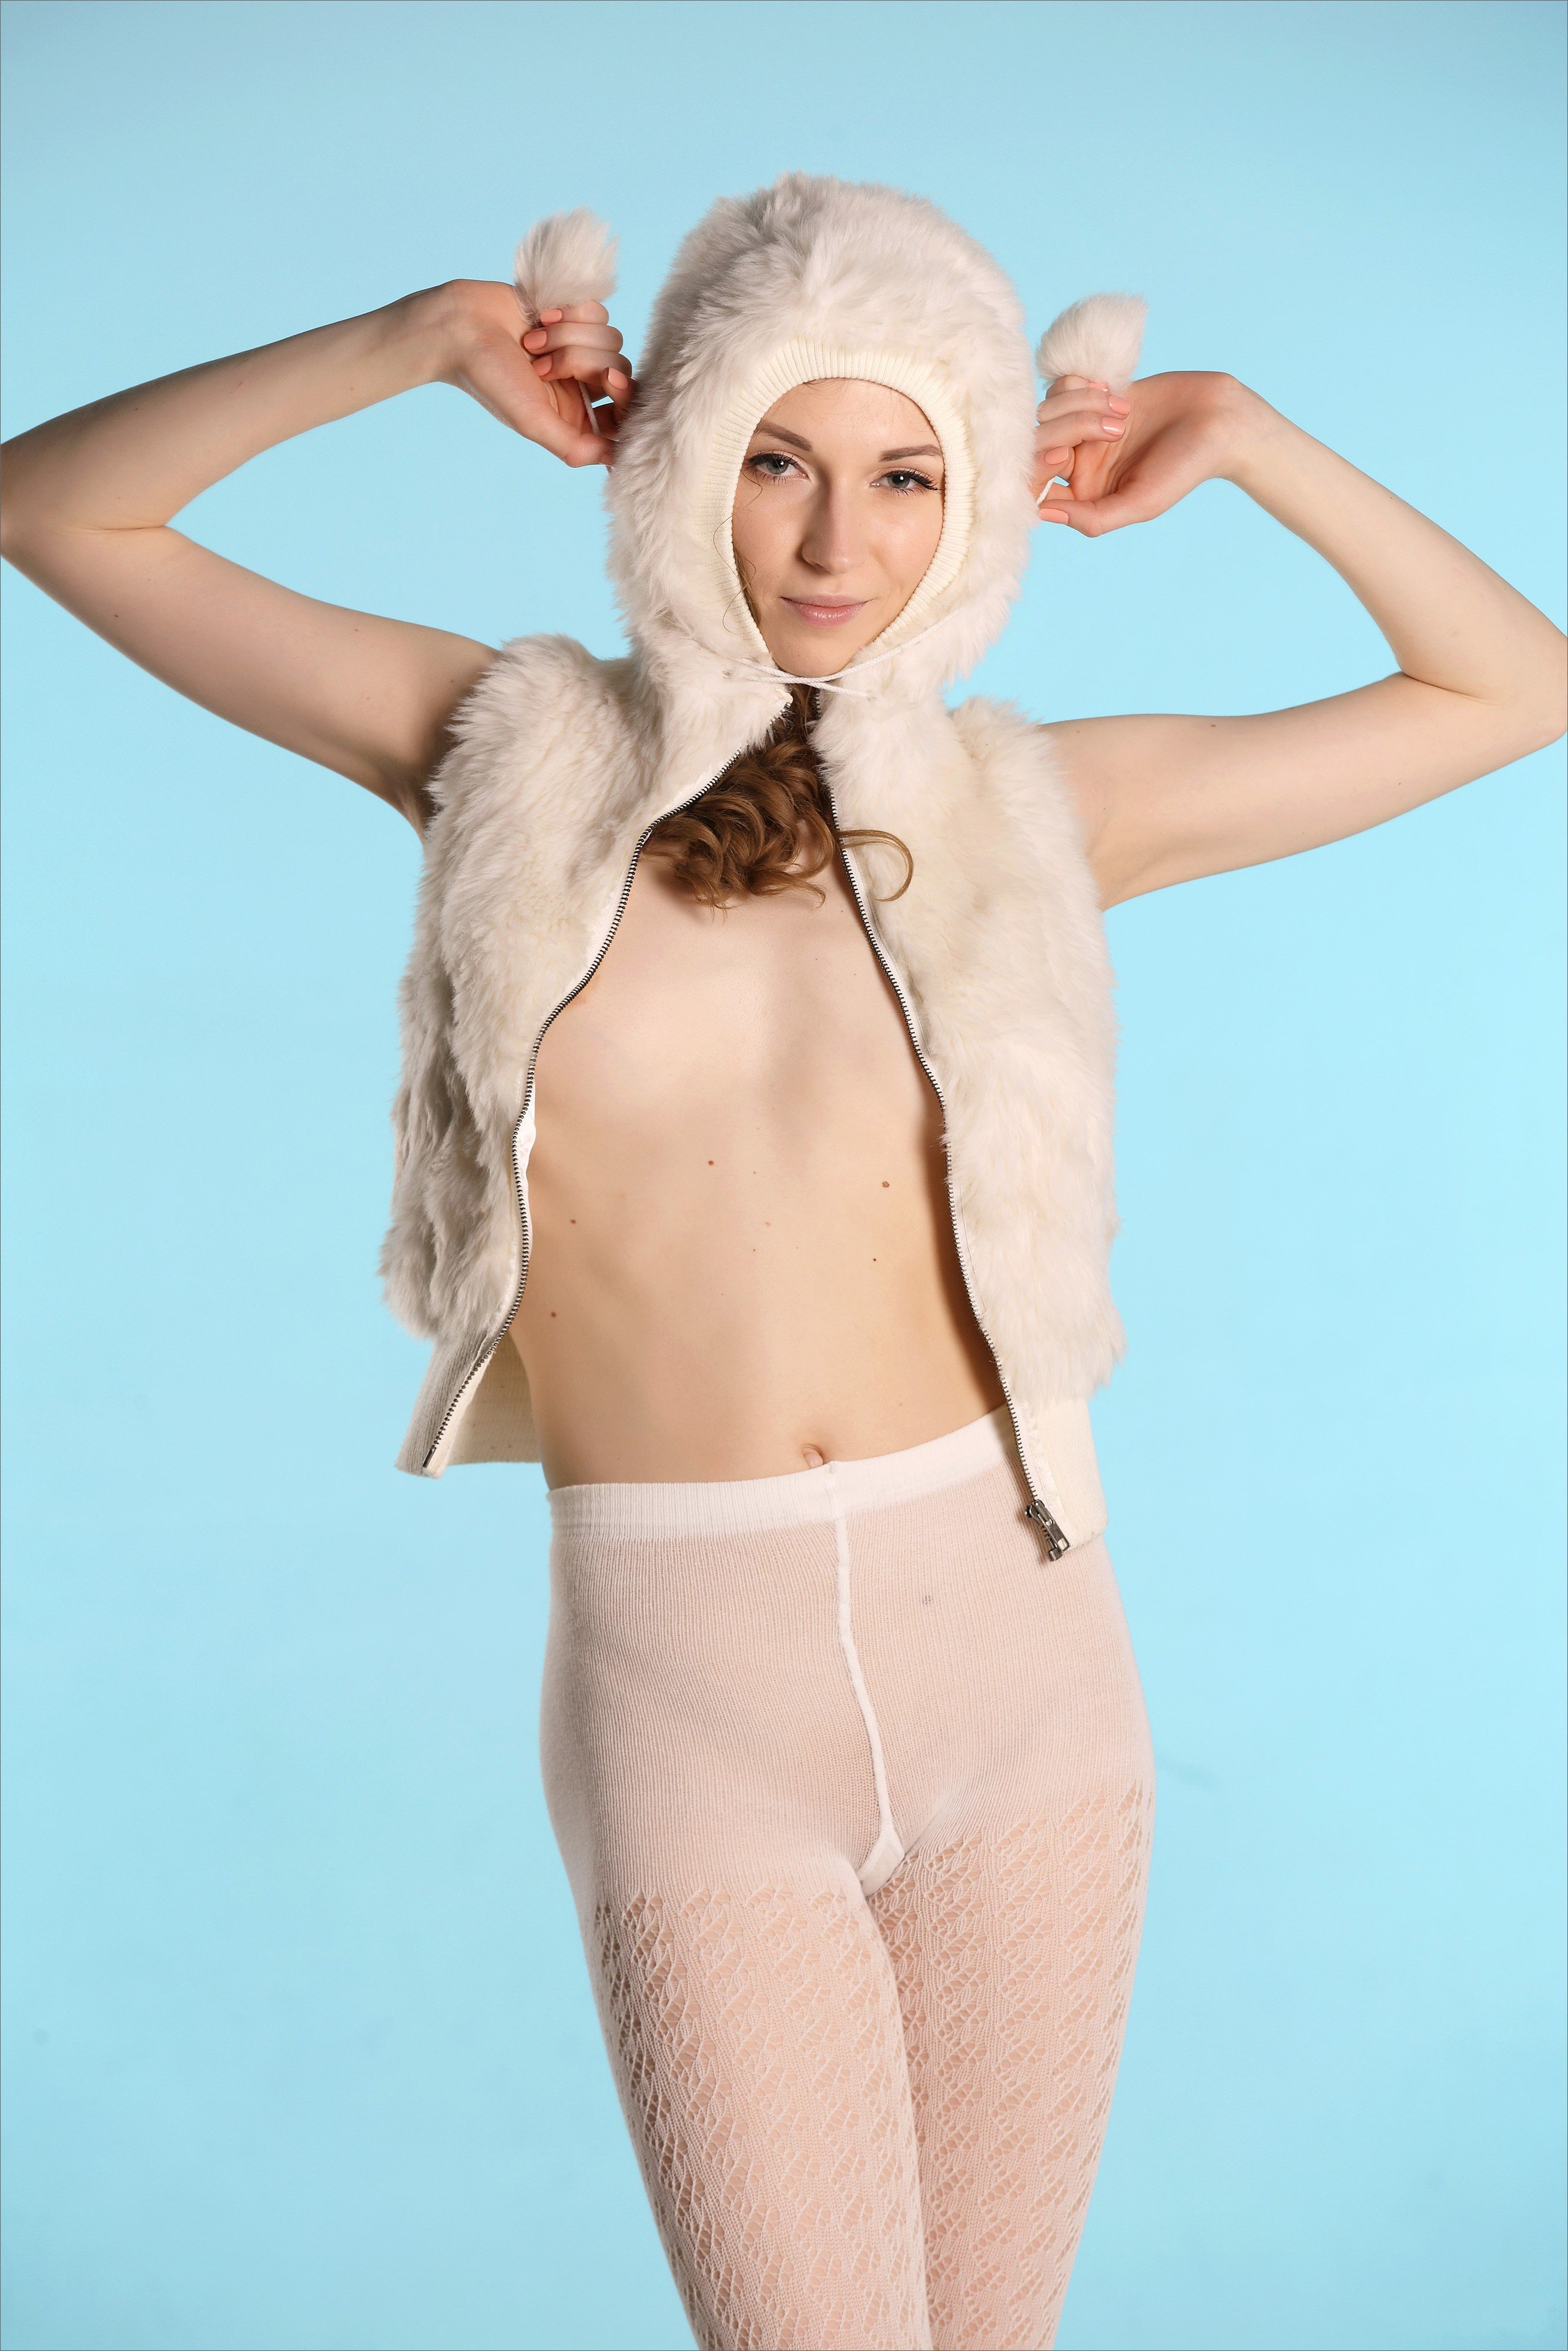 голые девушки киски попы фото